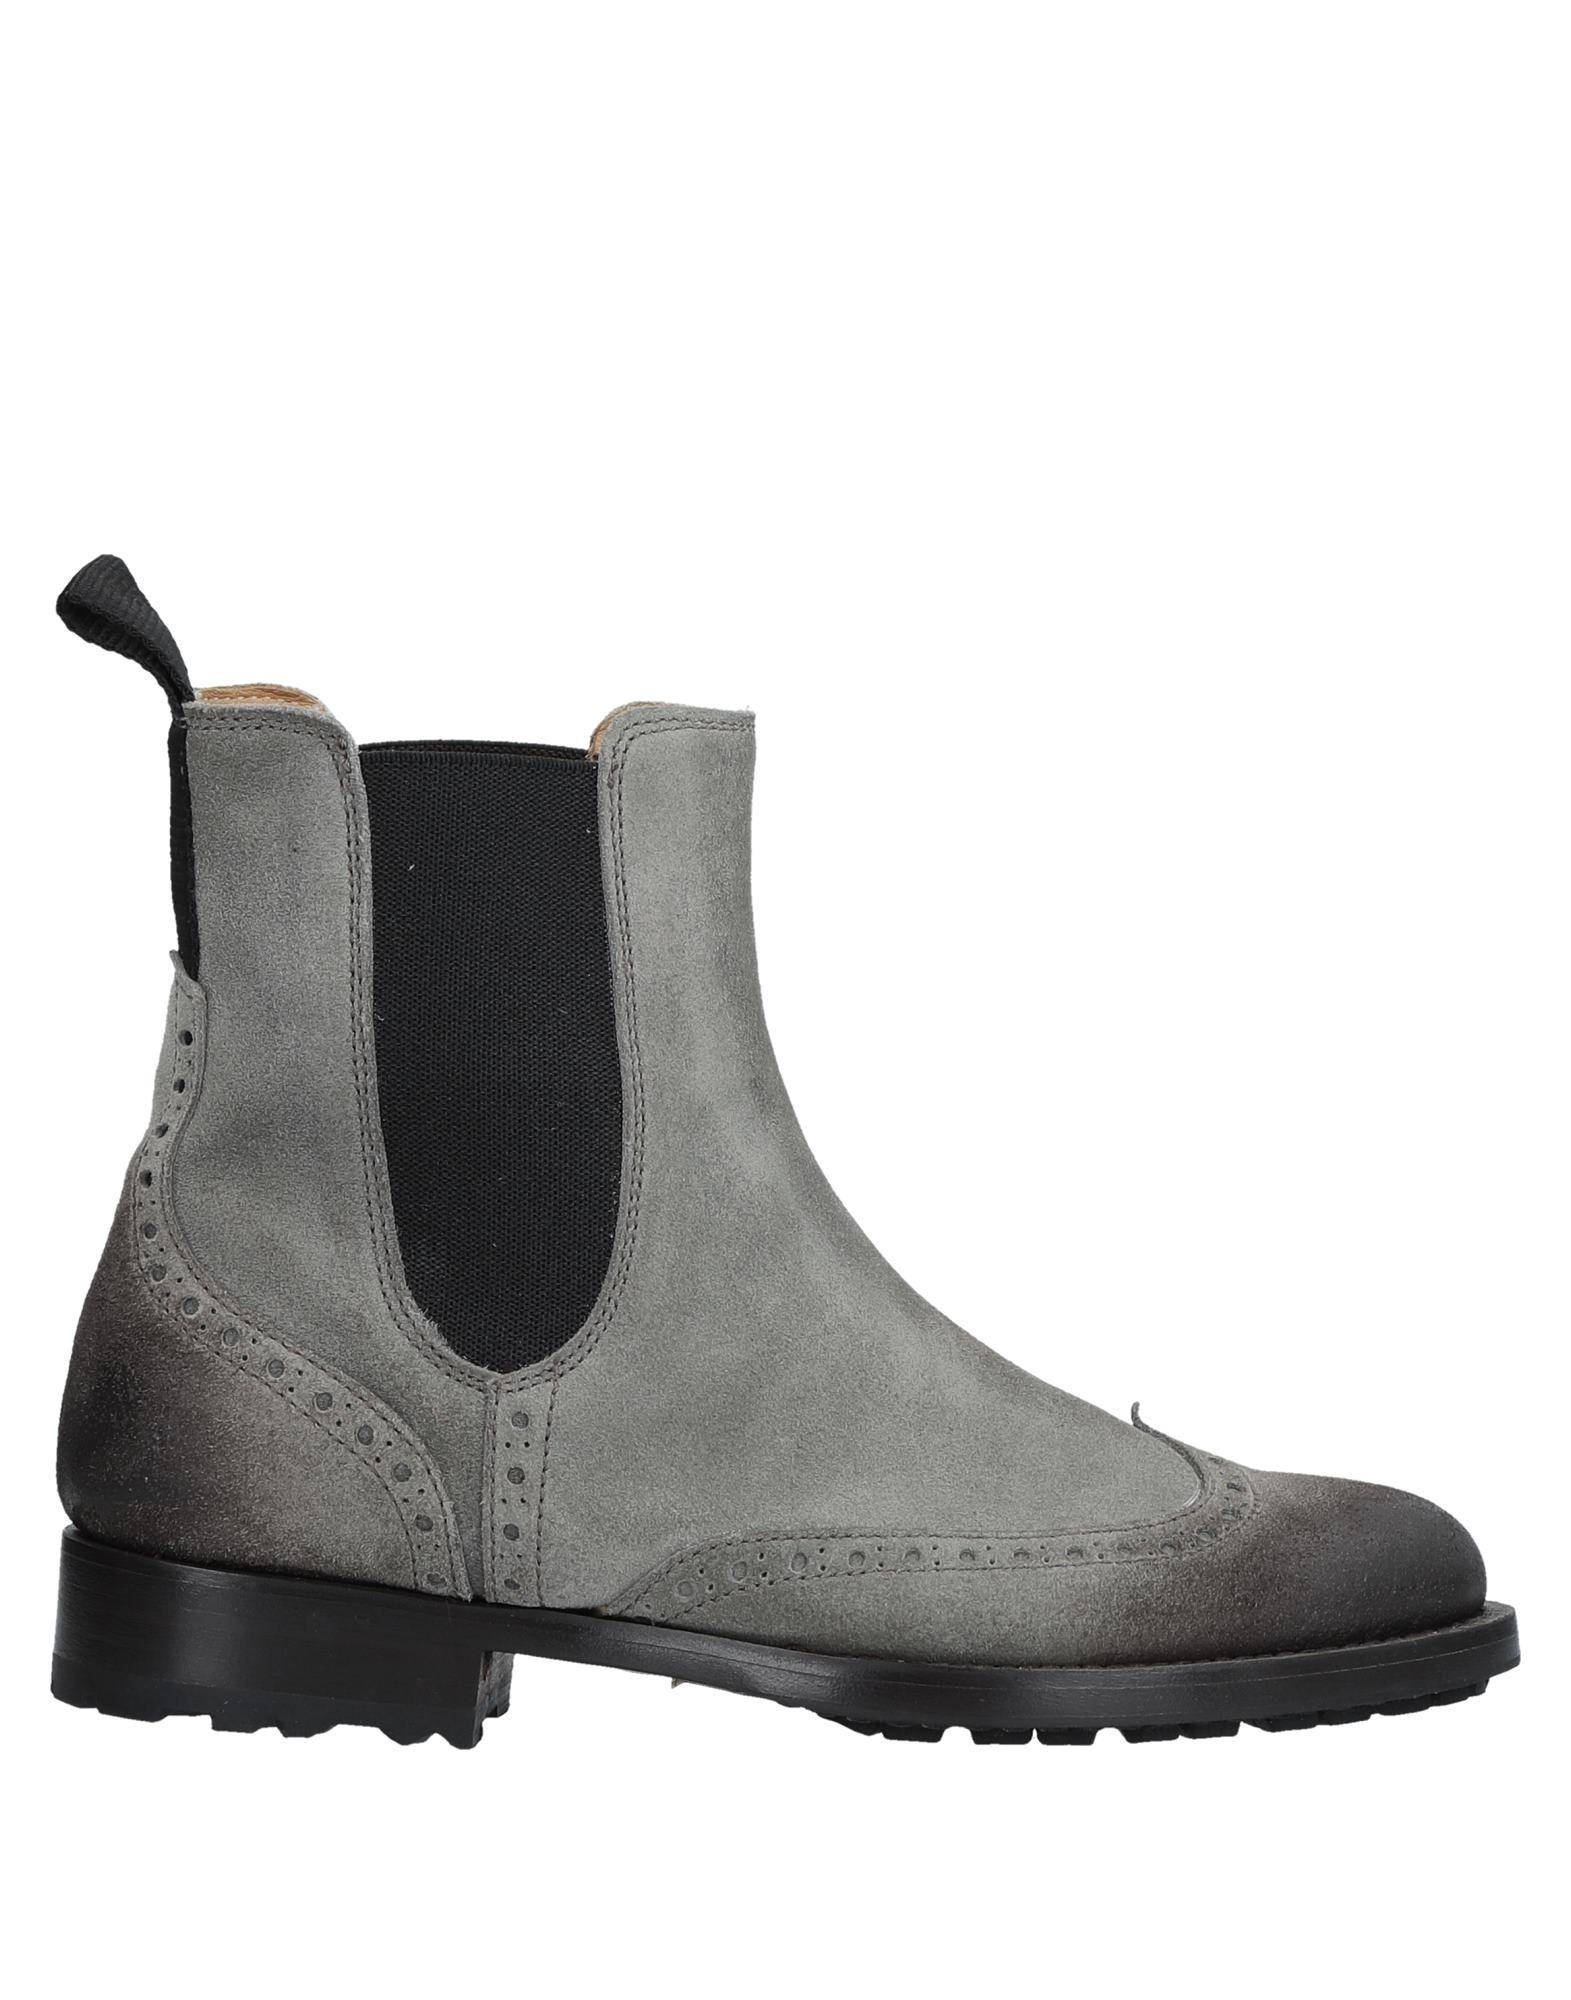 Lo.White Chelsea Boots Damen  11524967PQGut aussehende strapazierfähige Schuhe